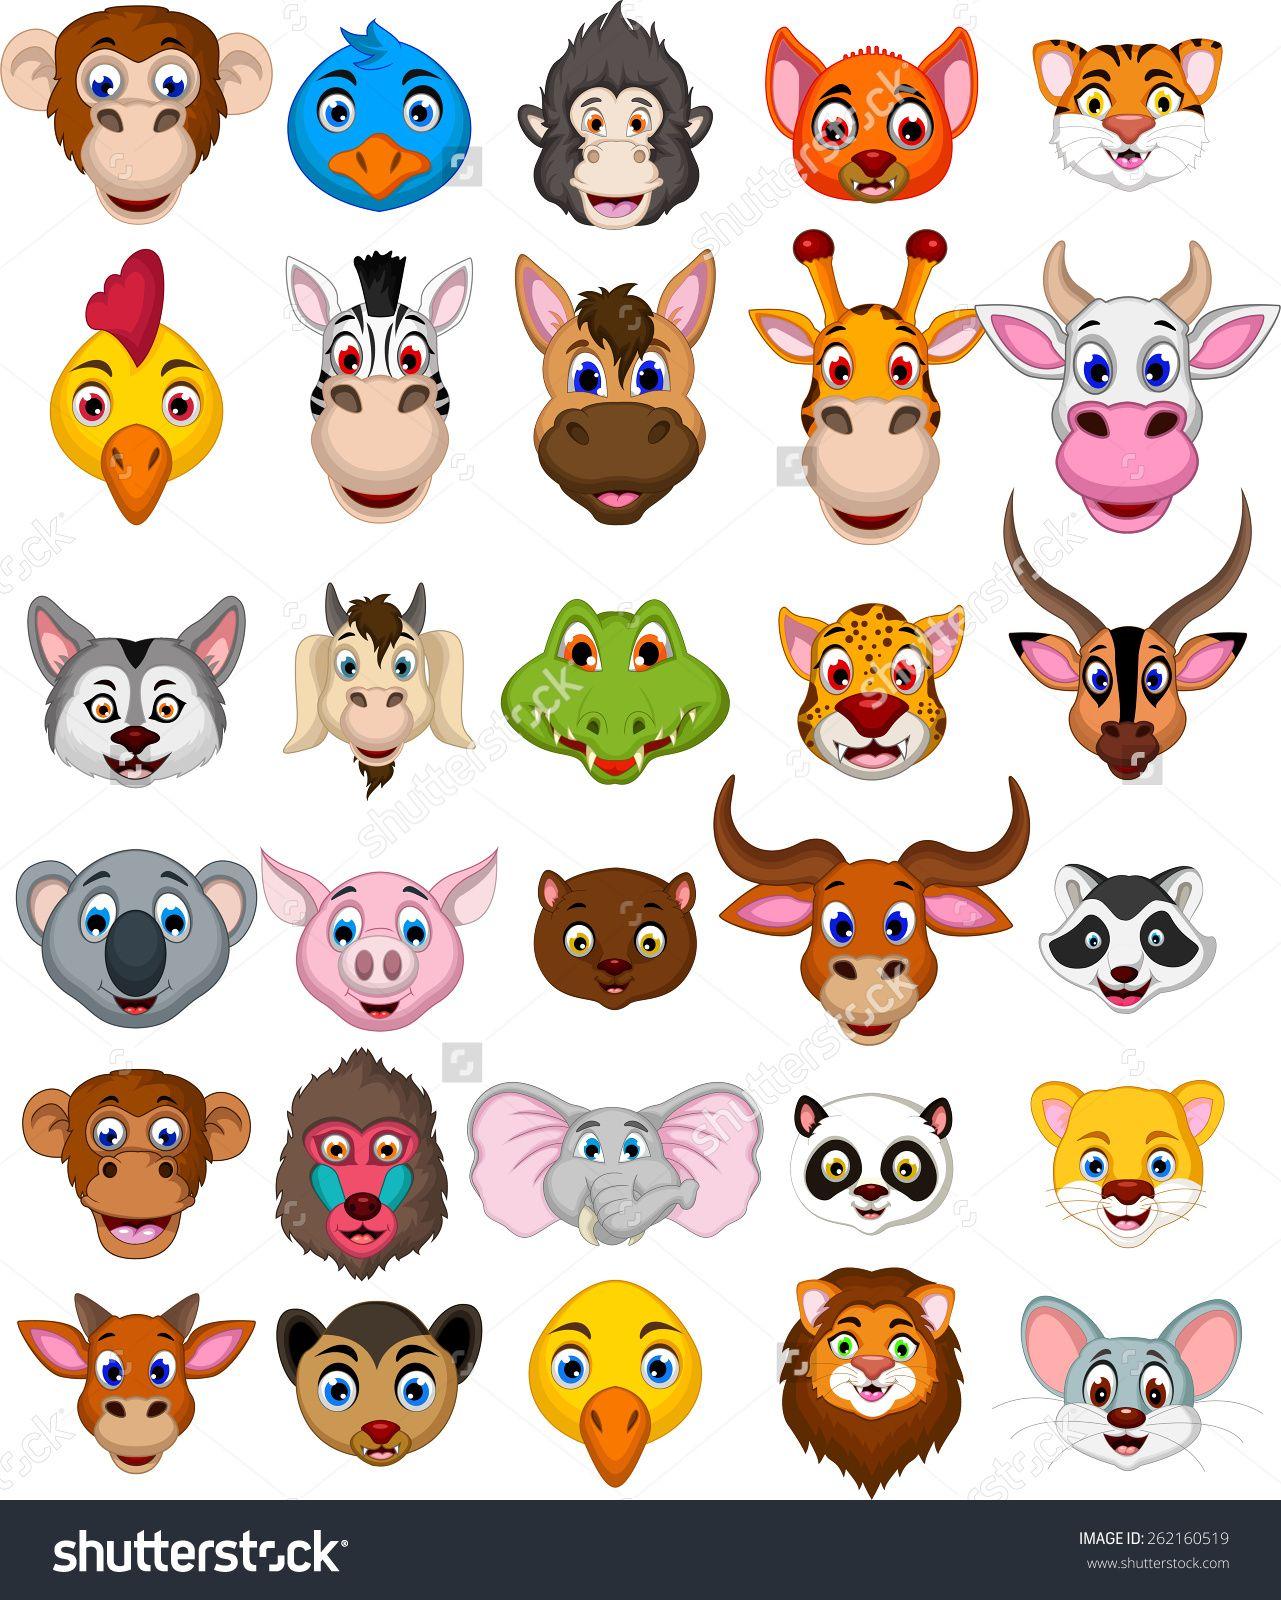 Big Animal Head Cartoon Collection Stock Vector Illustration 262160519 Shutterstock Big Animals Cartoon Animals Animal Heads